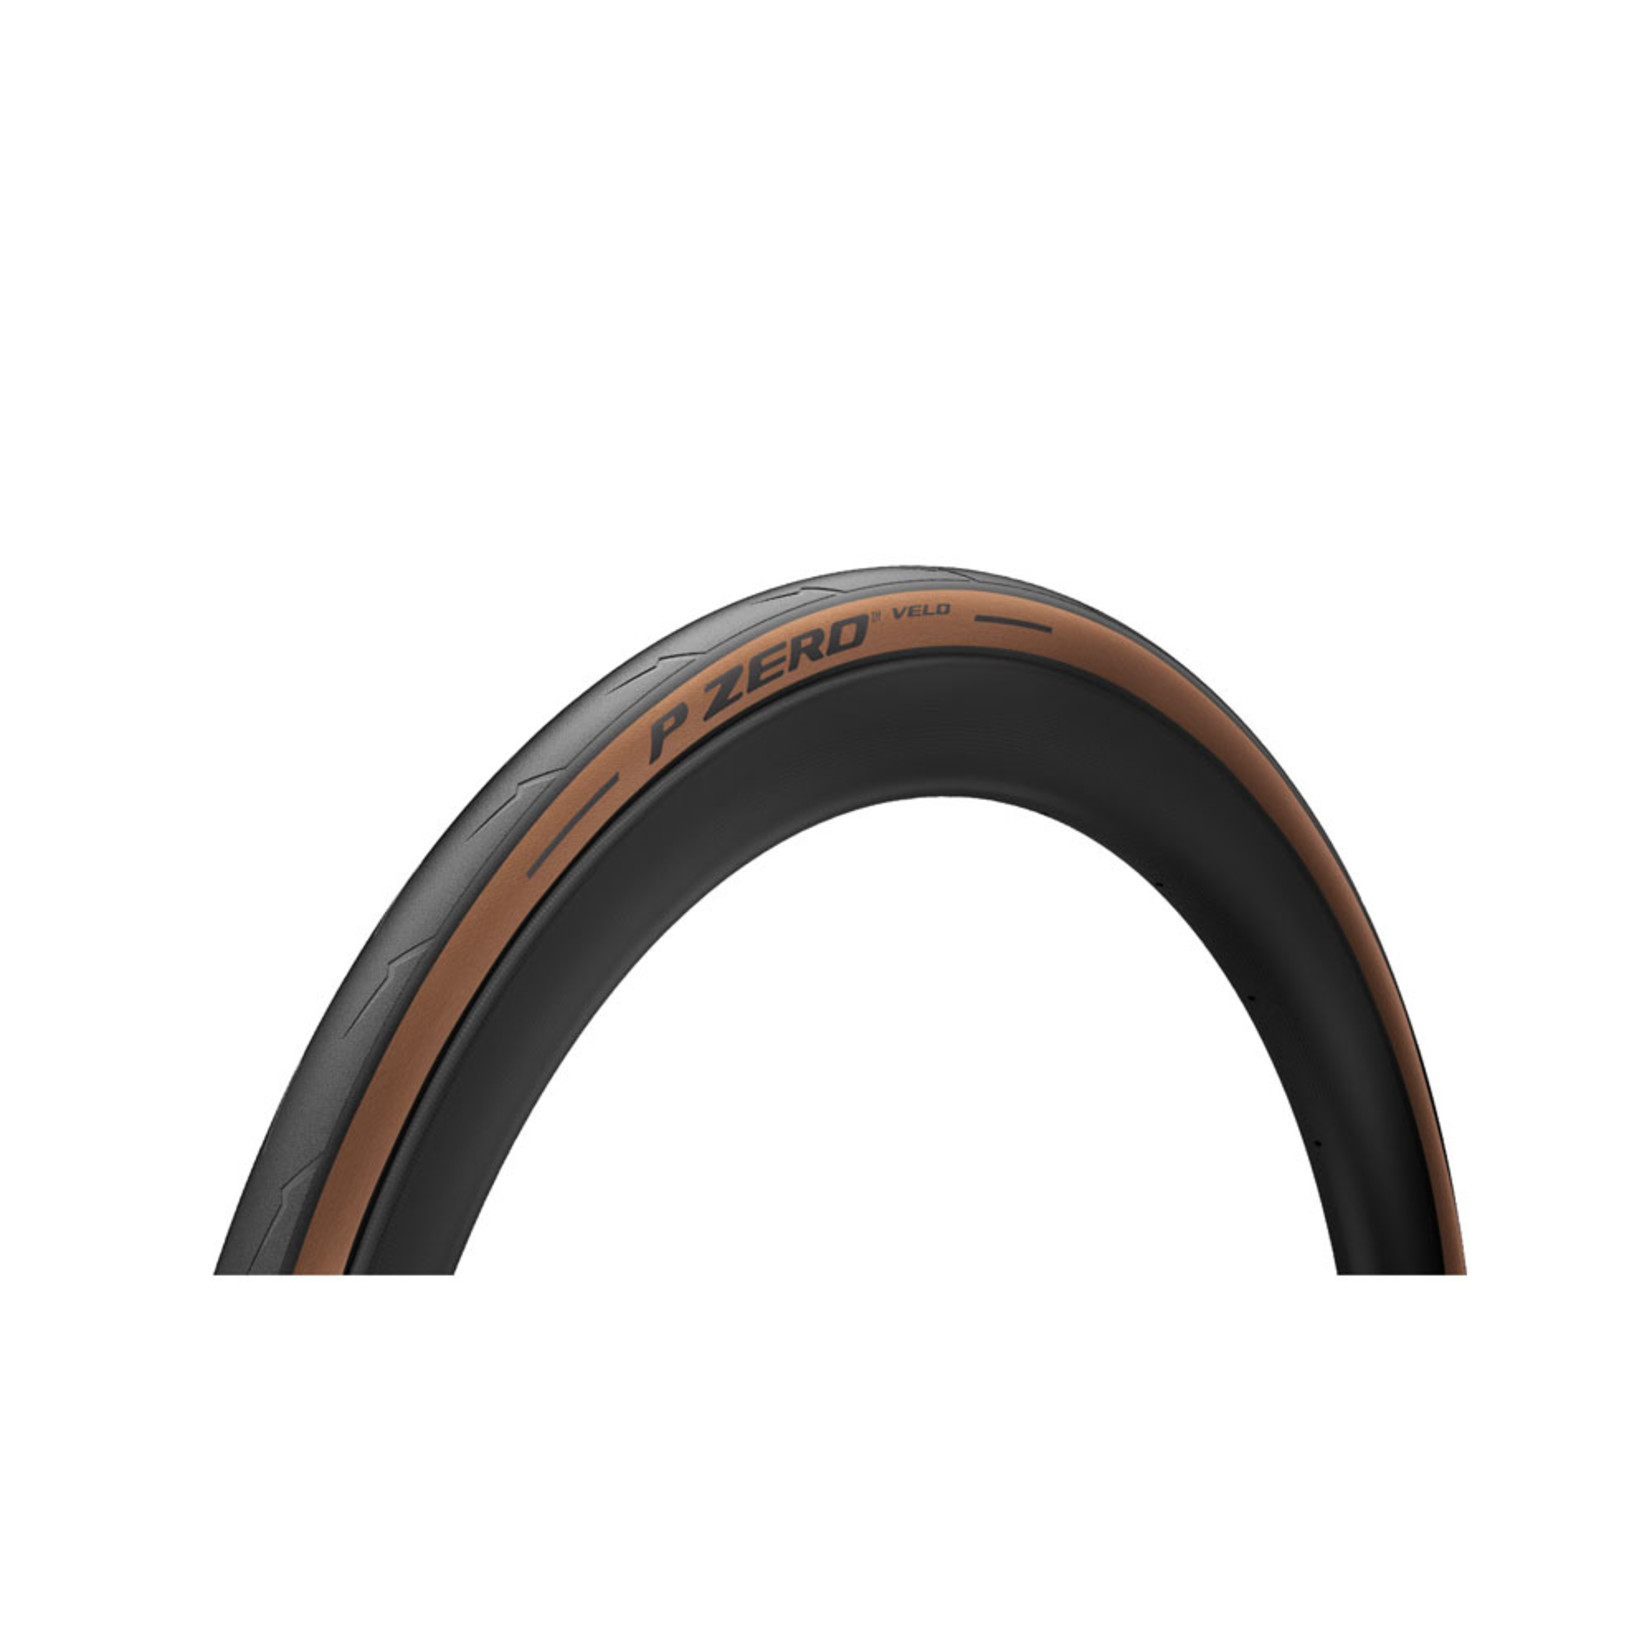 Pirelli Pirelli, P Zero Velo Classic Brown Folding